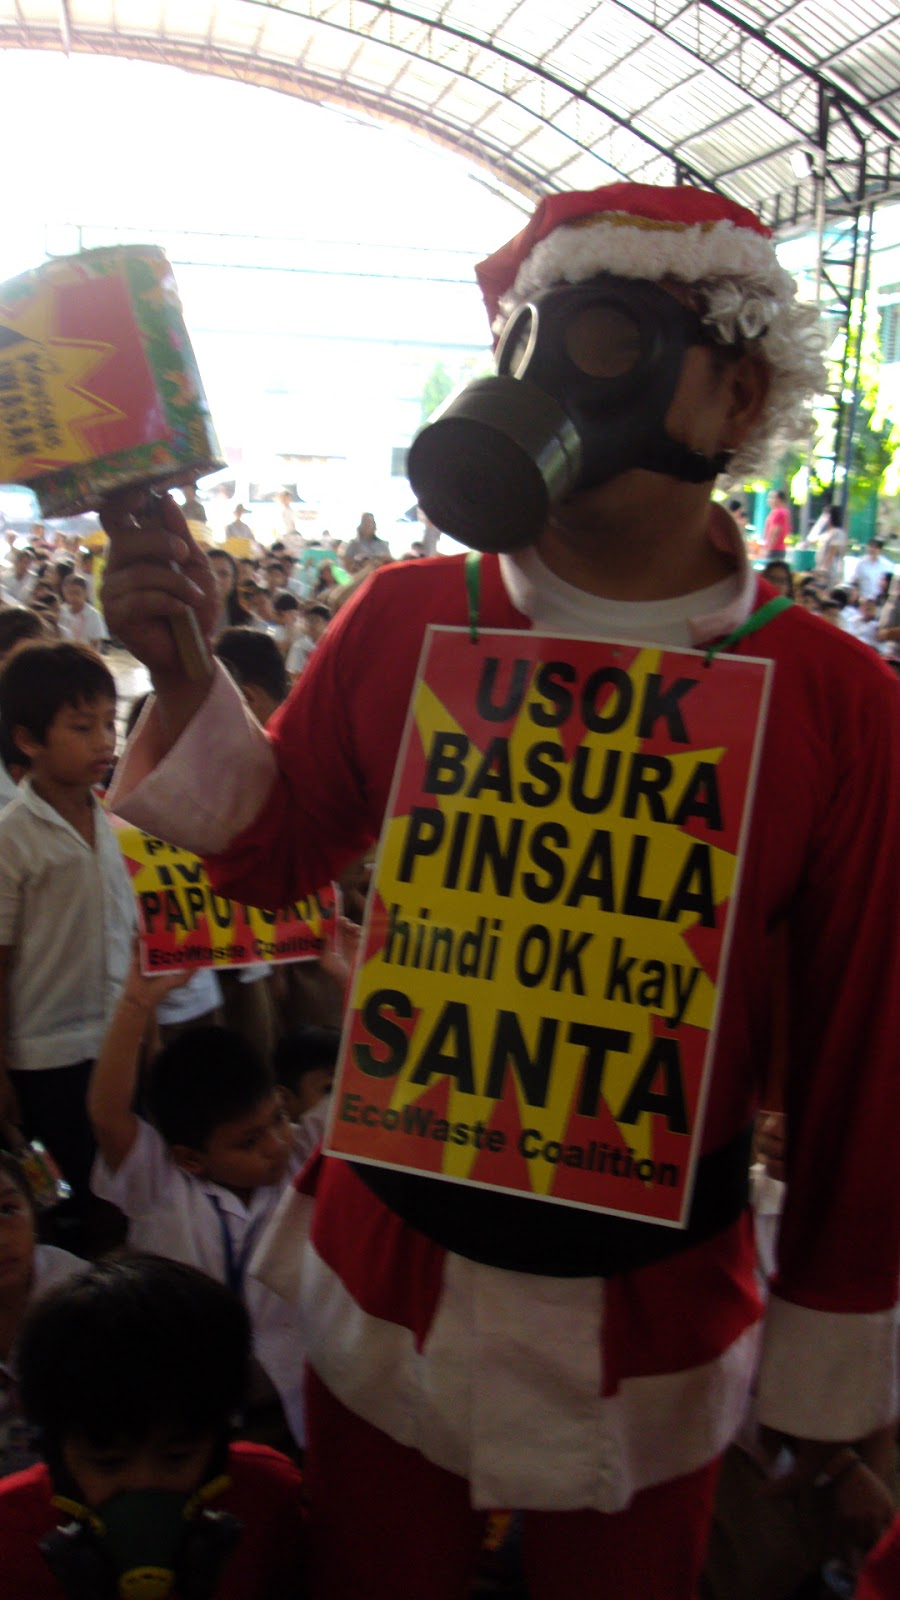 Manila Vendors Defy Ban on Mercury-Loaded Cosmetics – Ecowaste Coalition